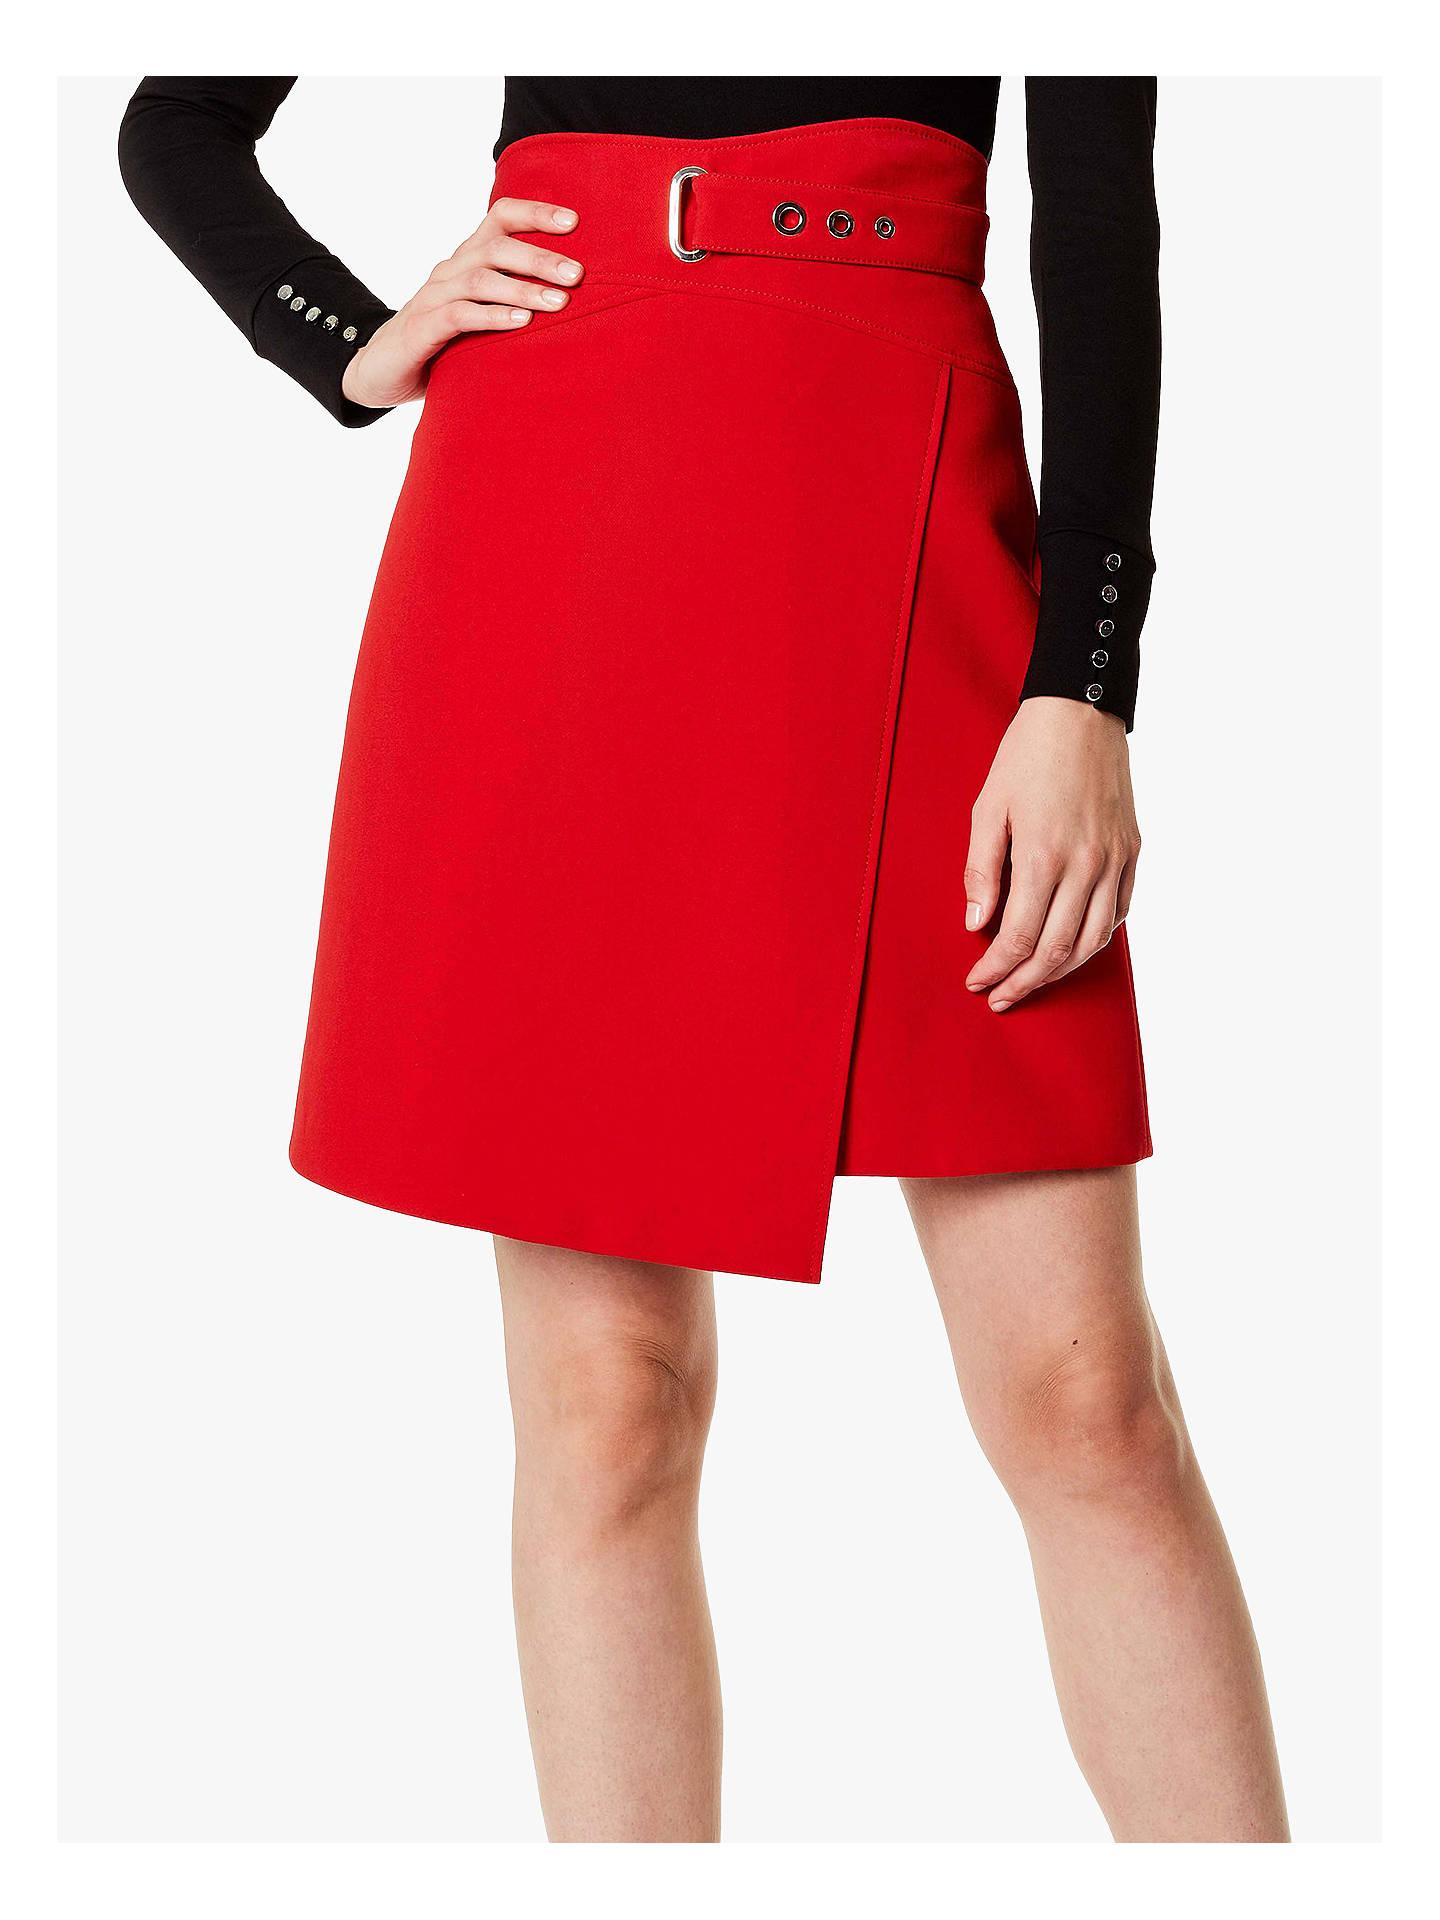 47d0aaca19 Buy Karen Millen A-line Wrap Mini Skirt, Red, 6 Online at johnlewis ...